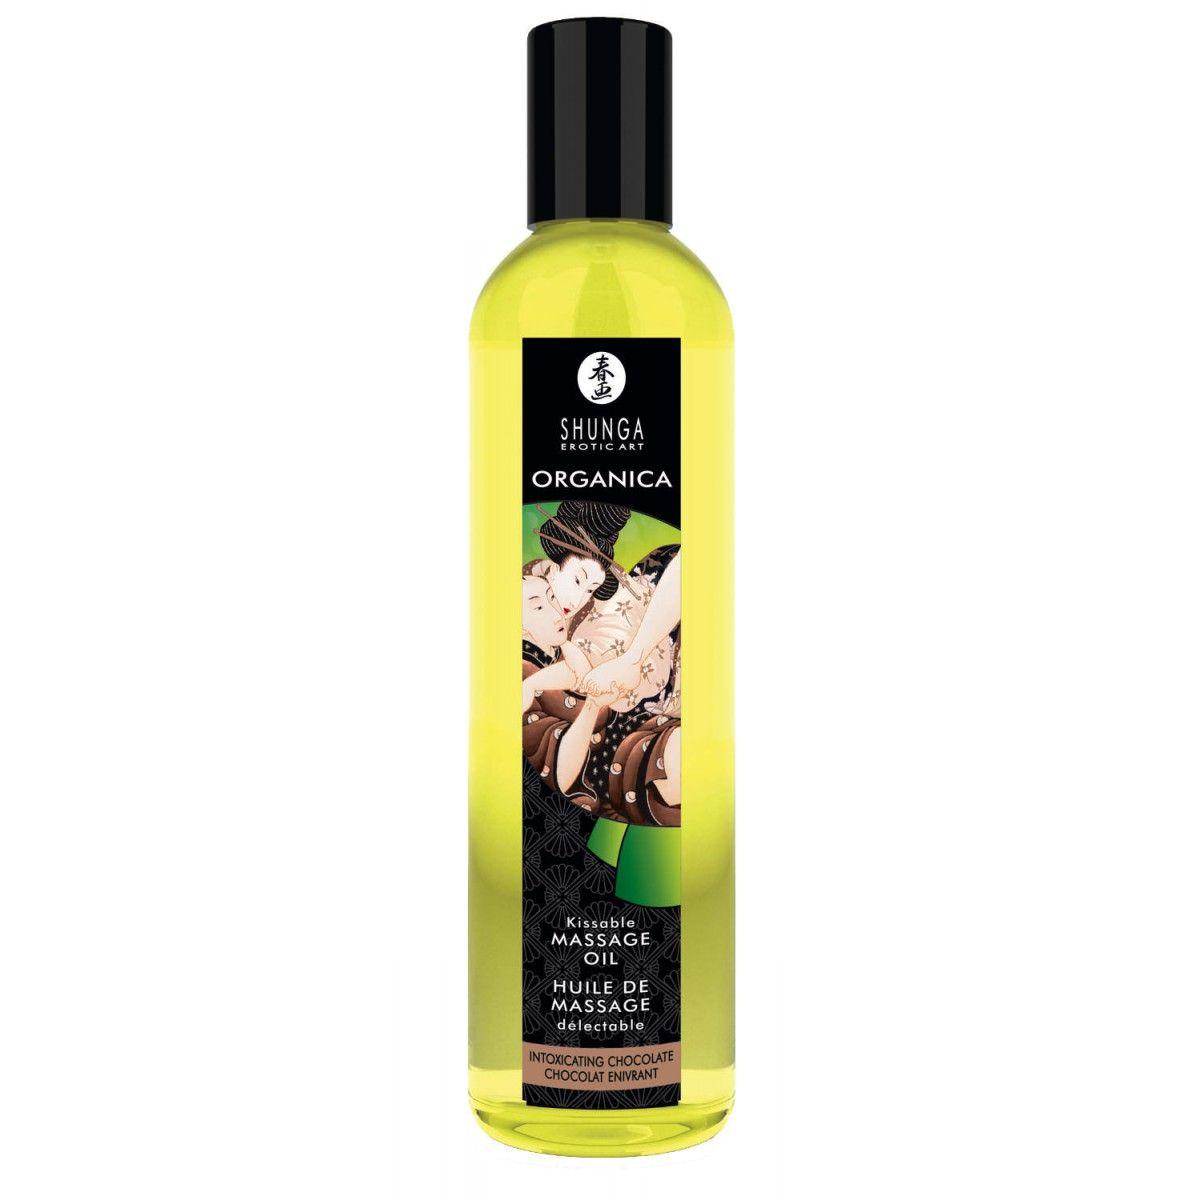 Sunga Erotic Art Organica Kissable Massage Oil Intoxicating Chocolate -